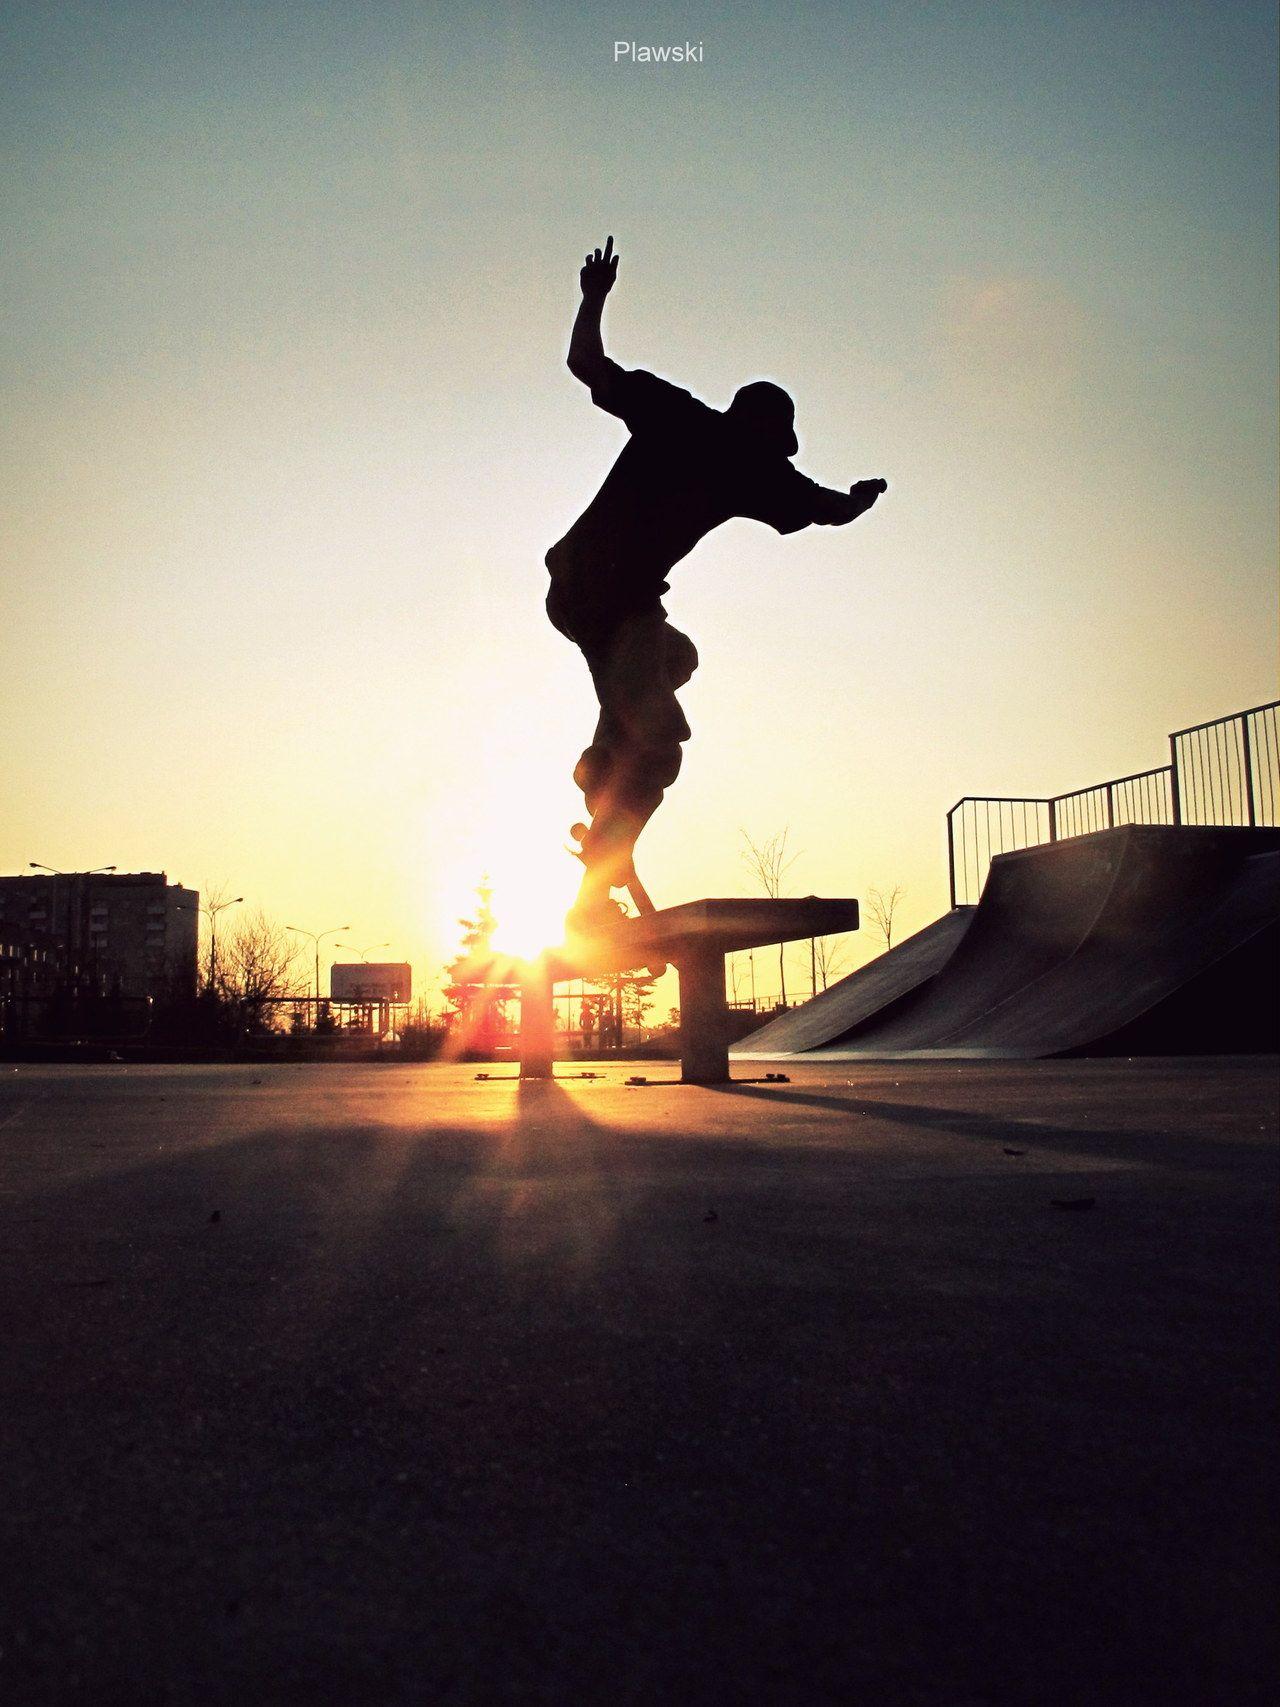 Skateboarding tumblr photography